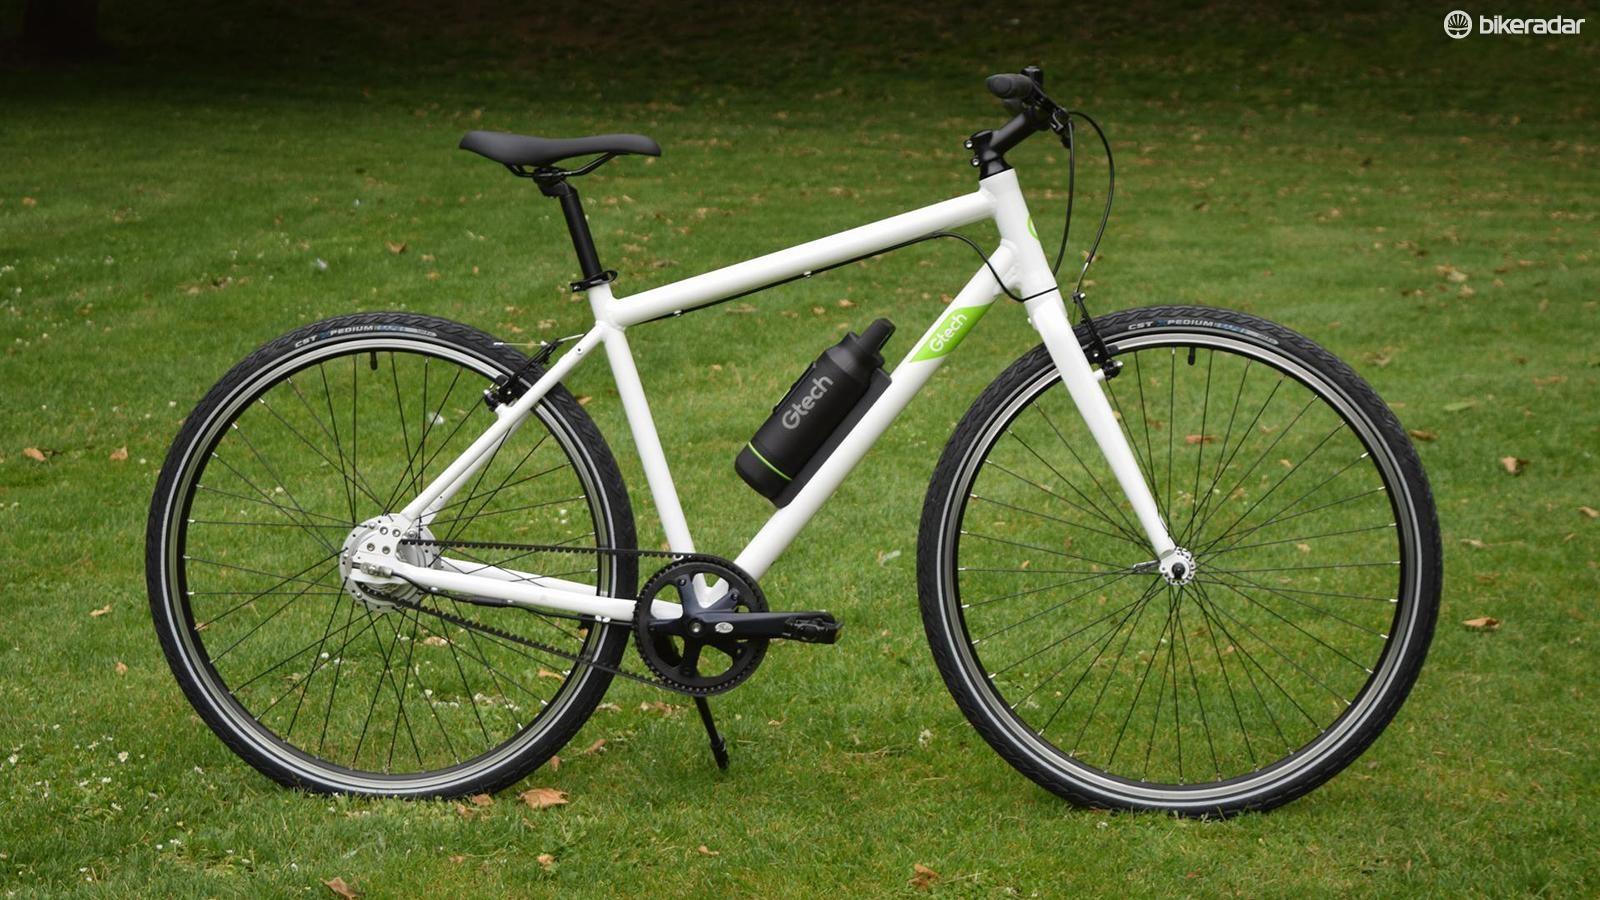 The Gtech is an appealingly simple e-bike